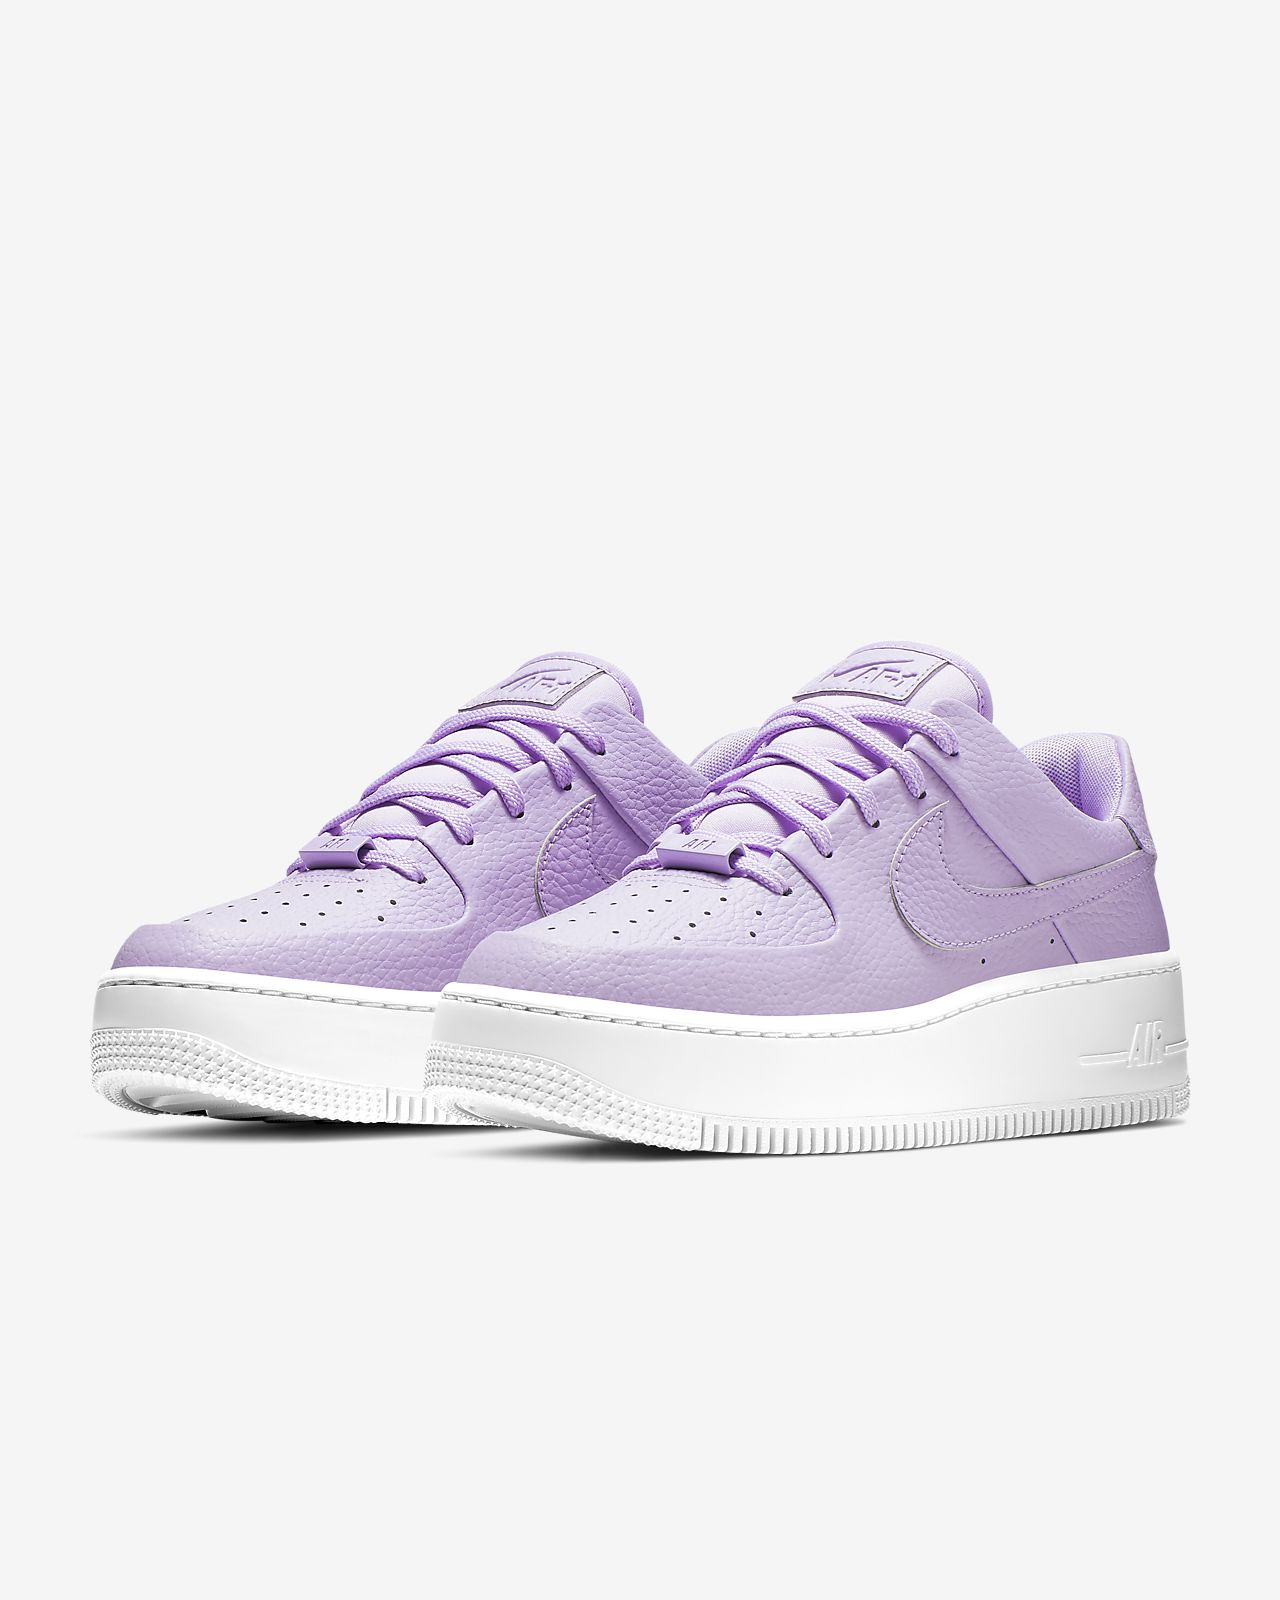 timeless design 6dc66 87848 ... Skon Nike Air Force 1 Sage Low för kvinnor